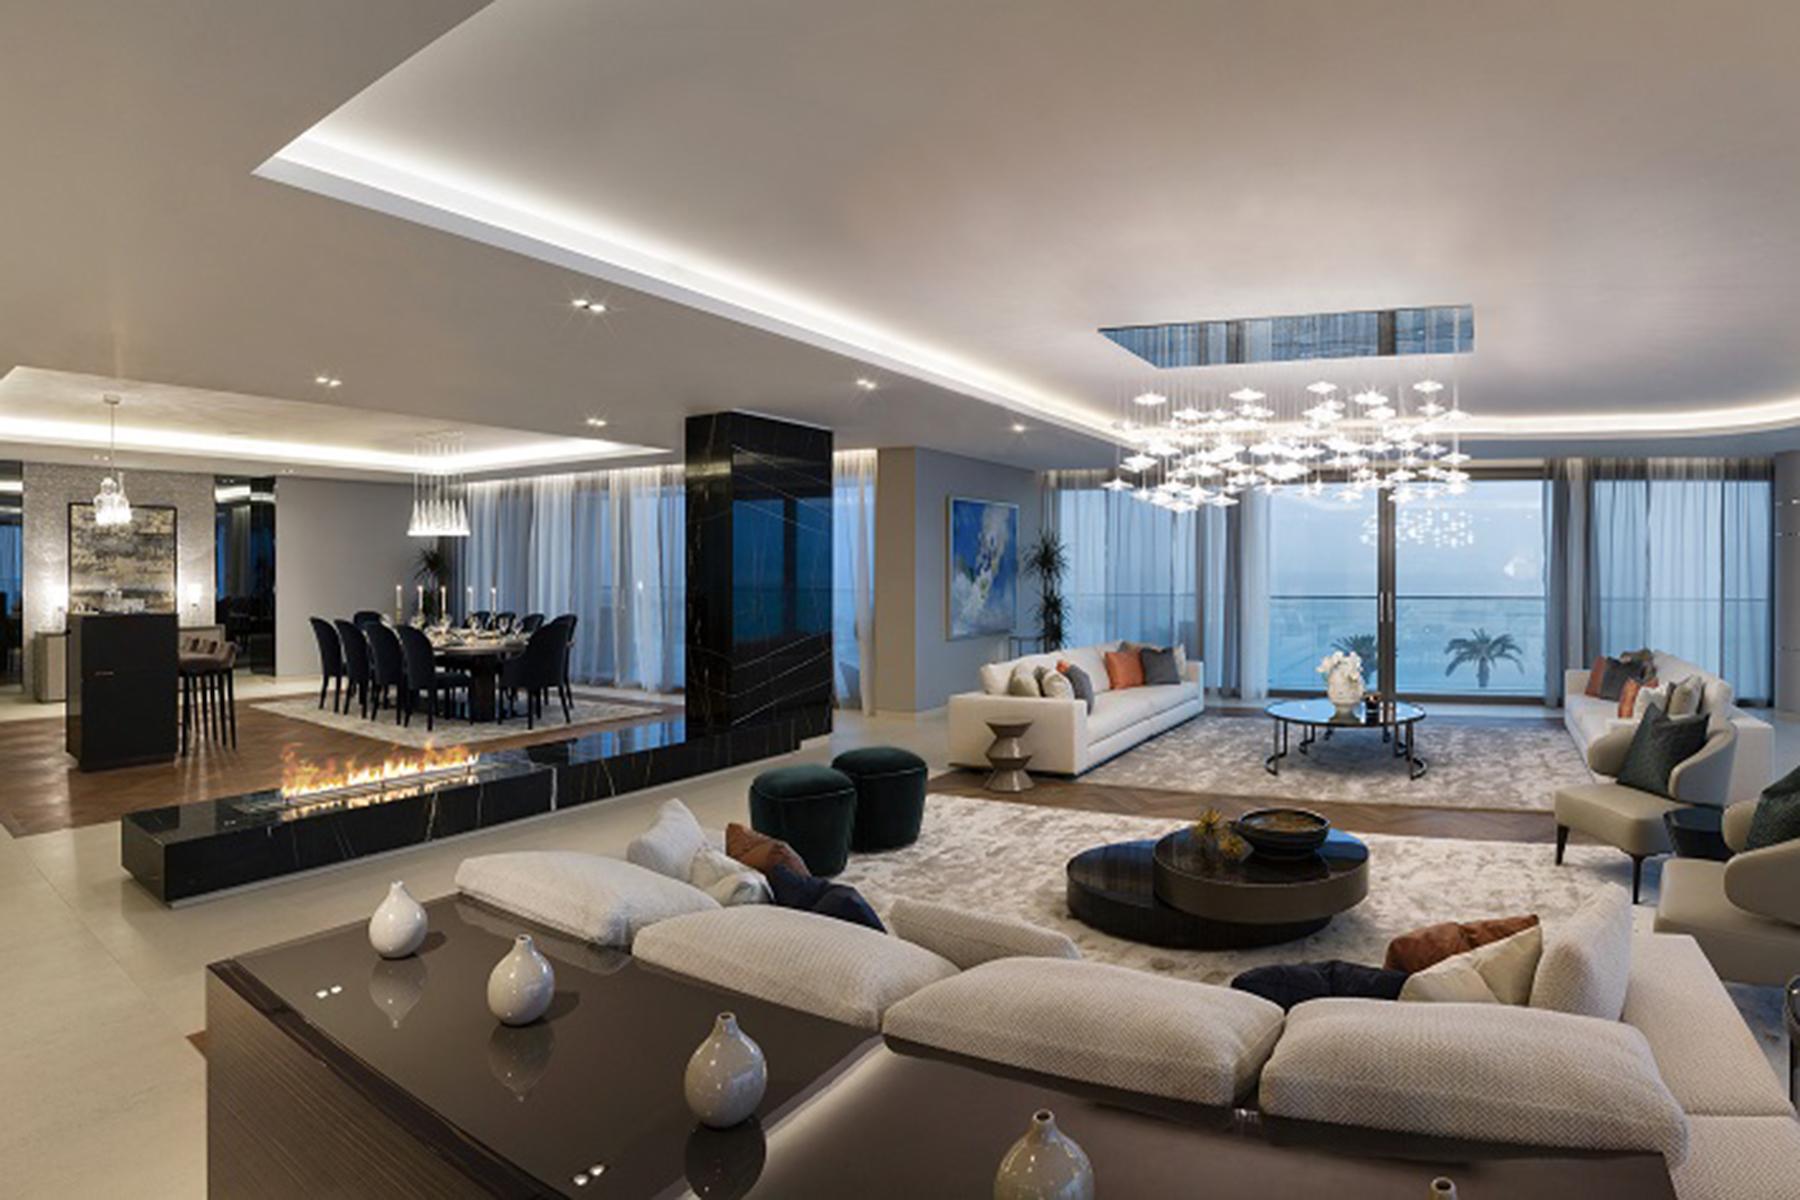 Apartment for Sale at Alef Residence Facing the Gulf Penthouse Palm Jumeirah Alef Residences, Dubai, 00000 United Arab Emirates